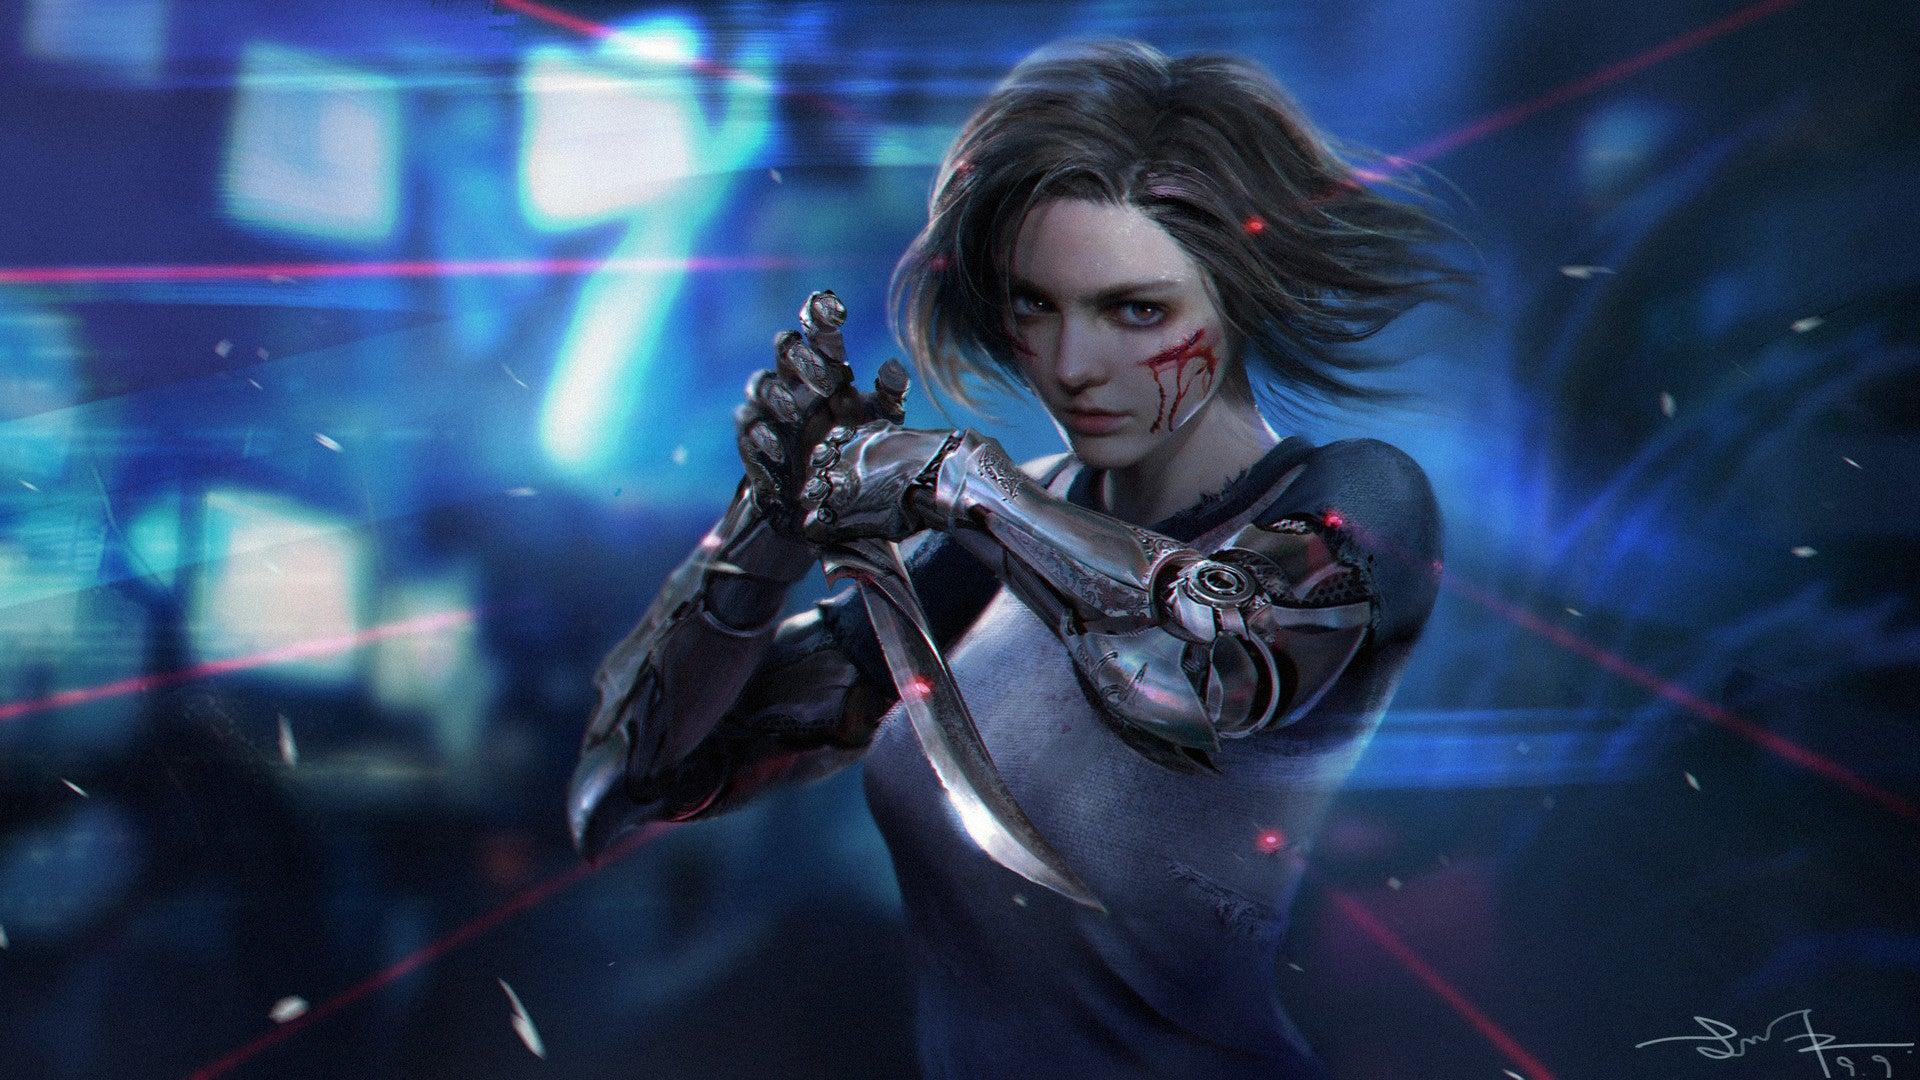 General 1920x1080 artwork digital art fantasy art Alita Alita: Battle Angel women dagger robot short hair blue